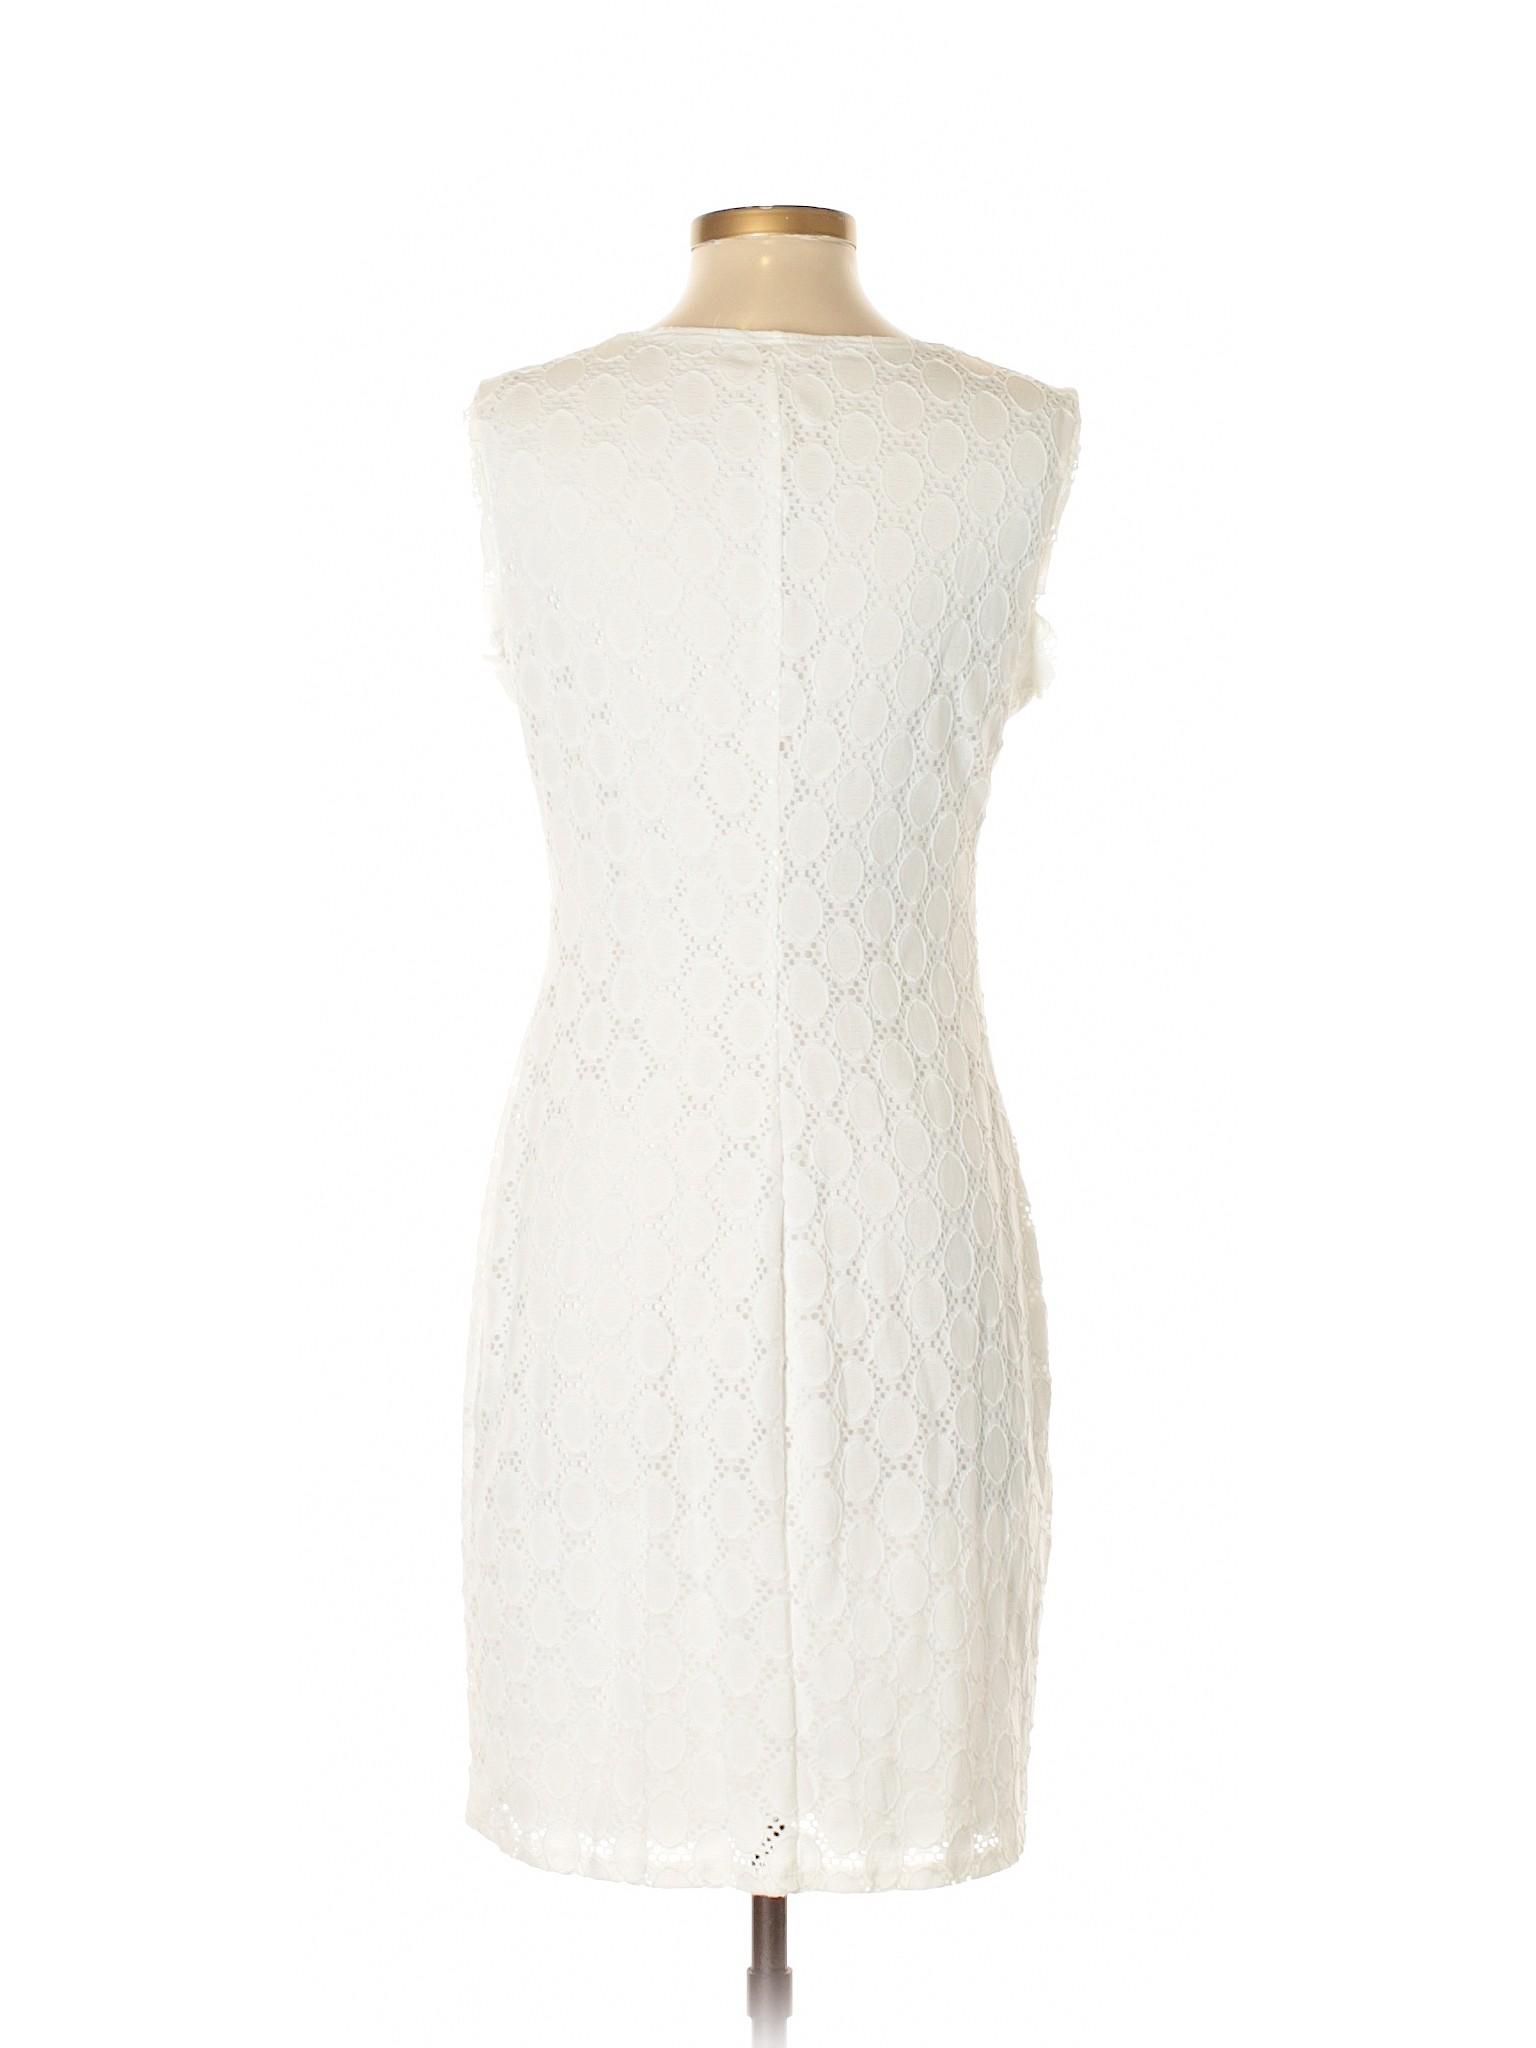 Selling Mizrahi Isaac Casual Mizrahi Selling Isaac Selling Dress Dress Casual xwxZE